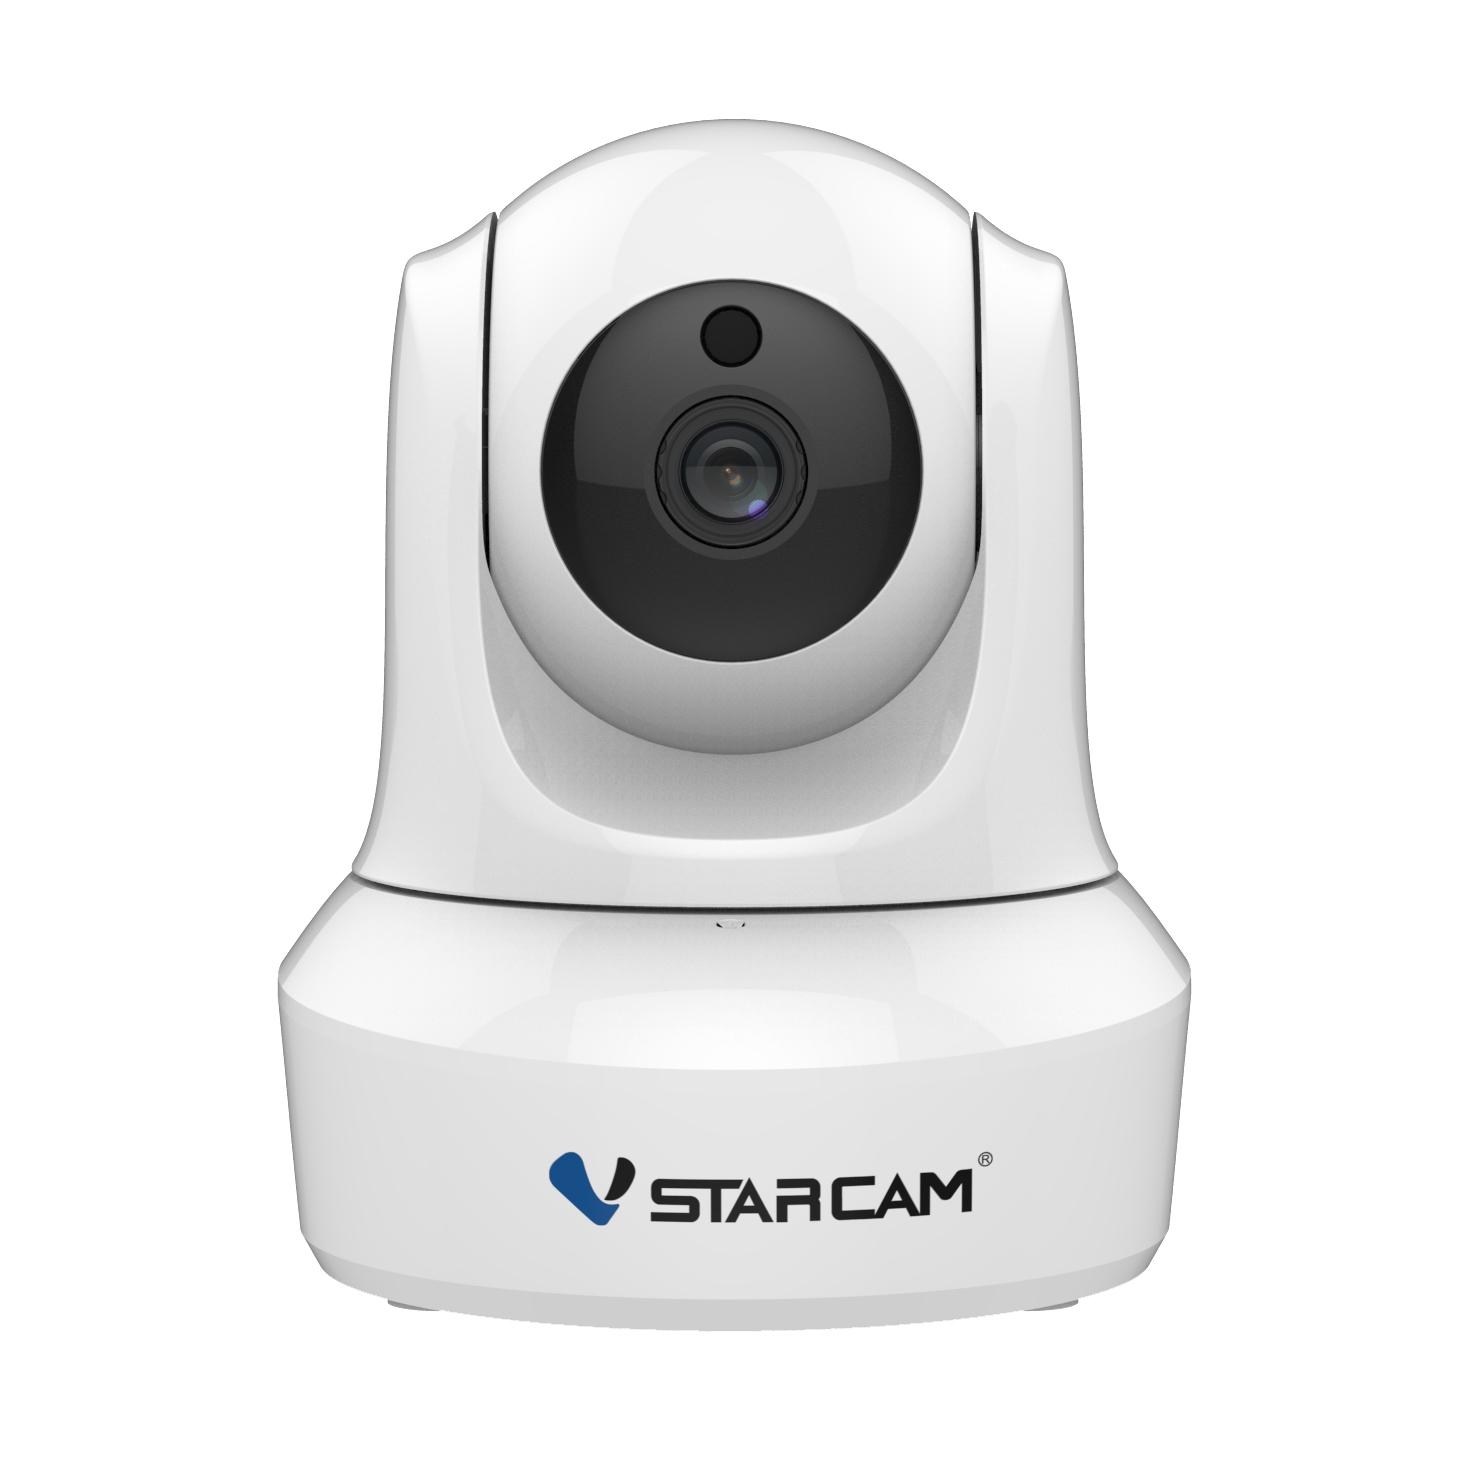 C29/C29S | VStarcam